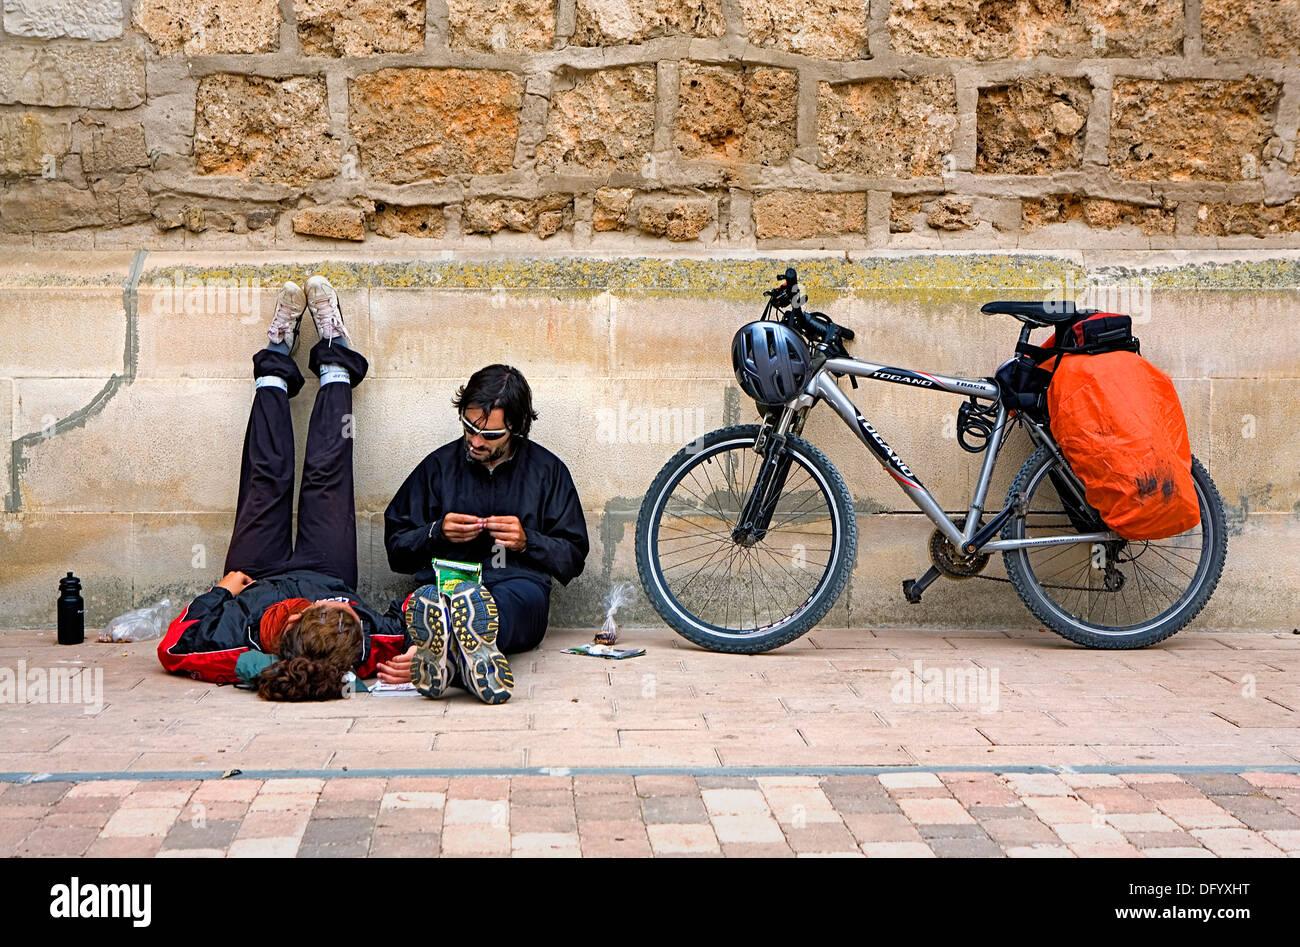 pilgrims resting. Belorado. Burgos province.Spain. Camino de Santiago - Stock Image